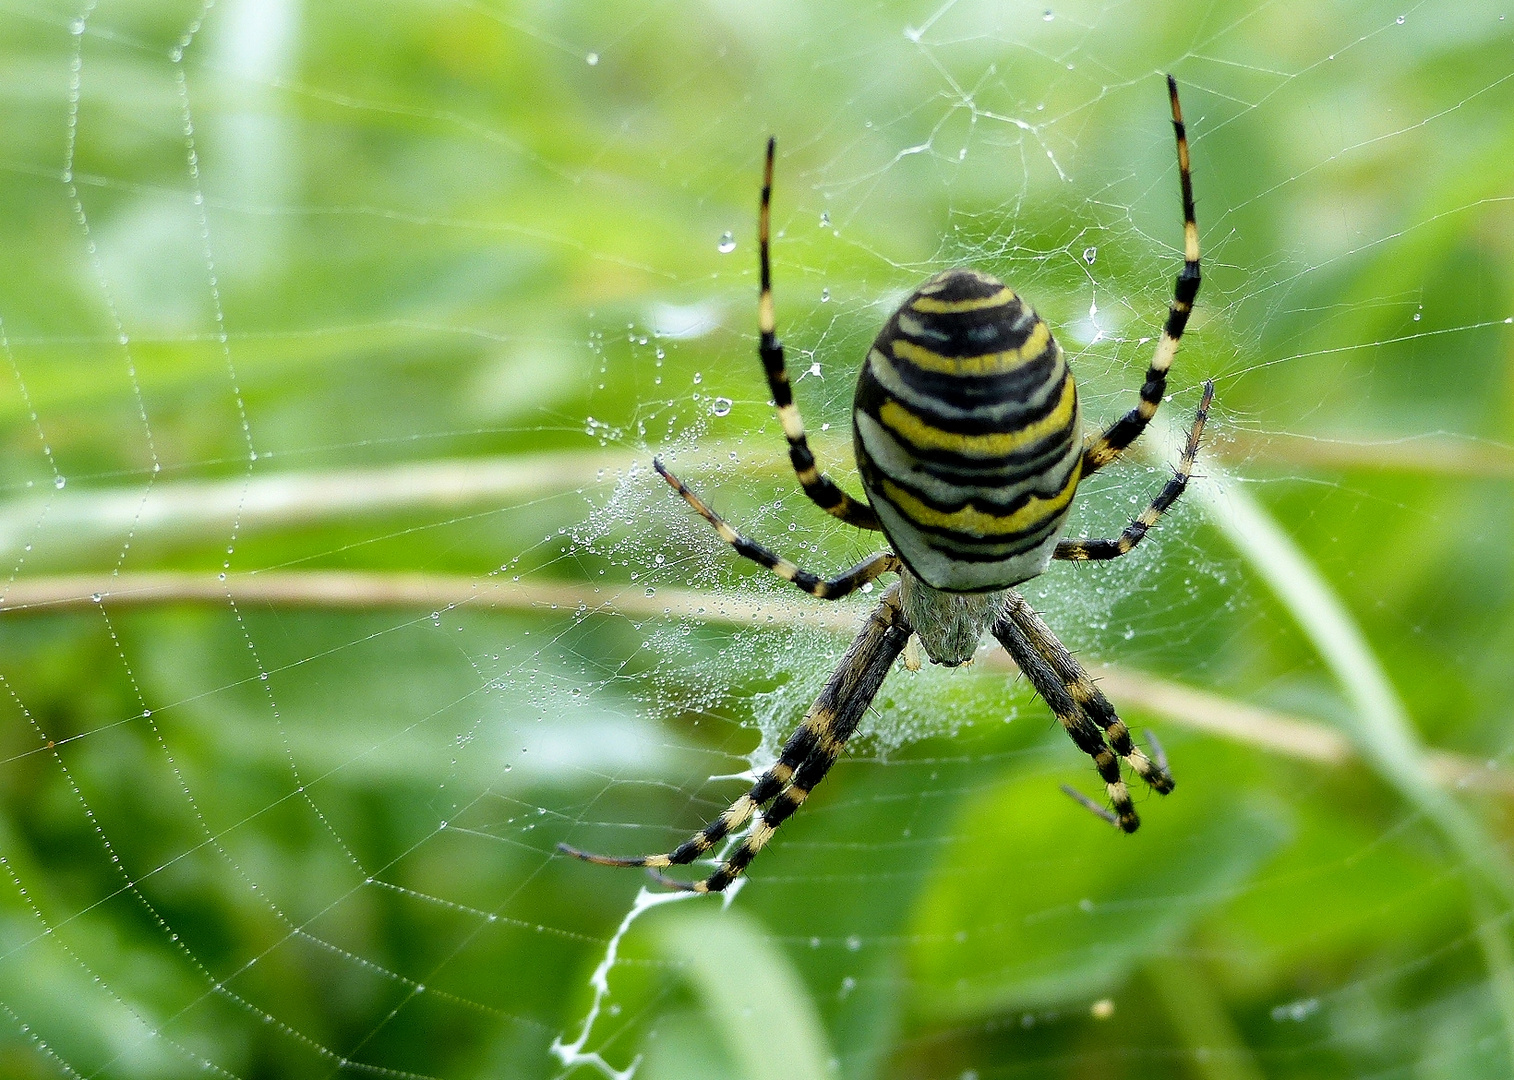 Wespenspinne in ihrem Net am frühen Morgen ,